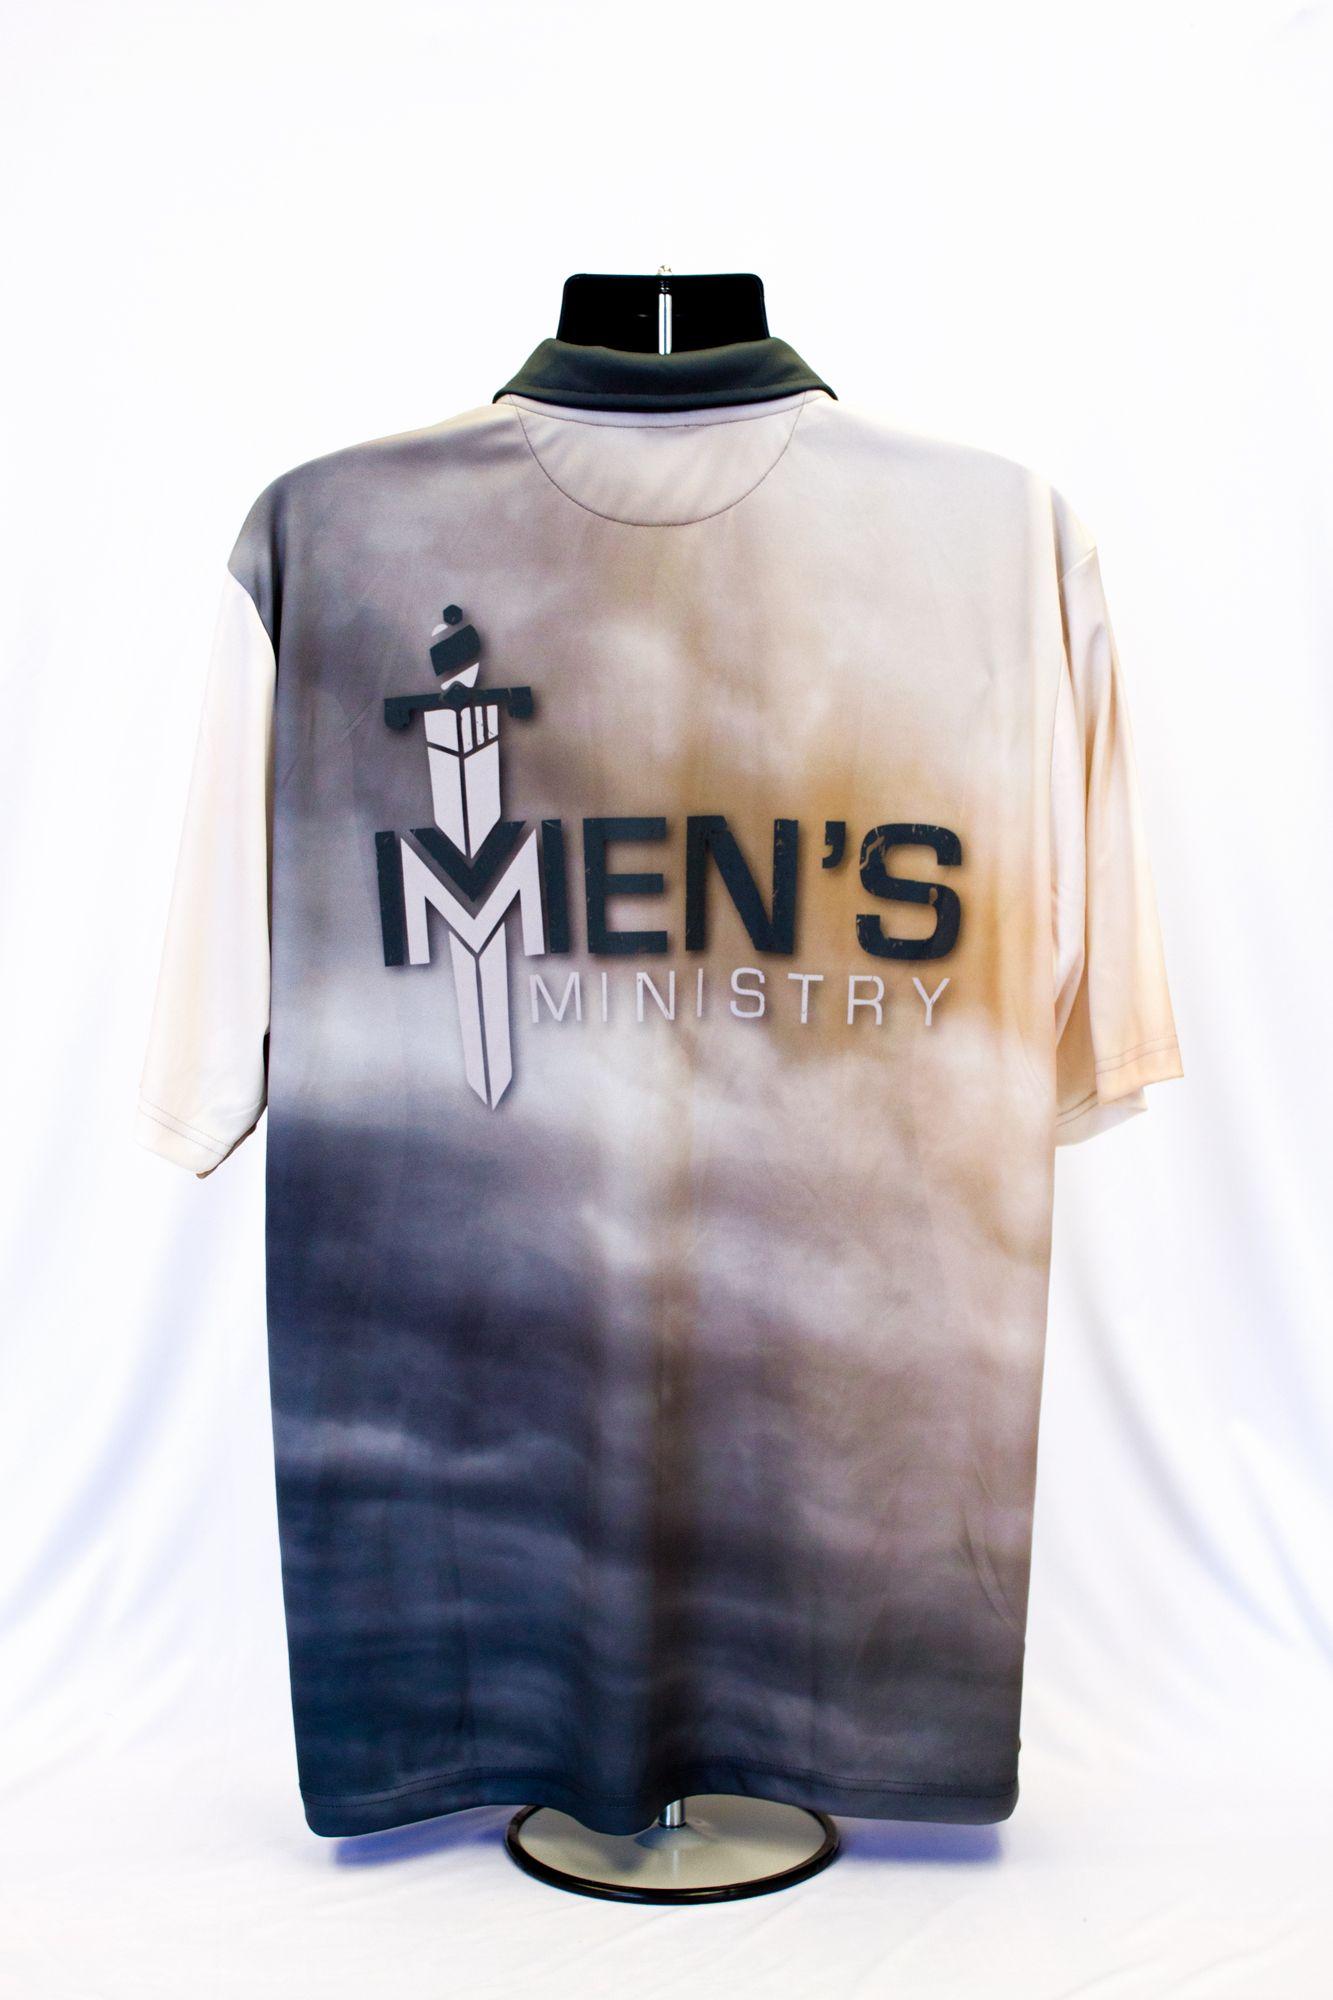 Men's Ministry Group - Back